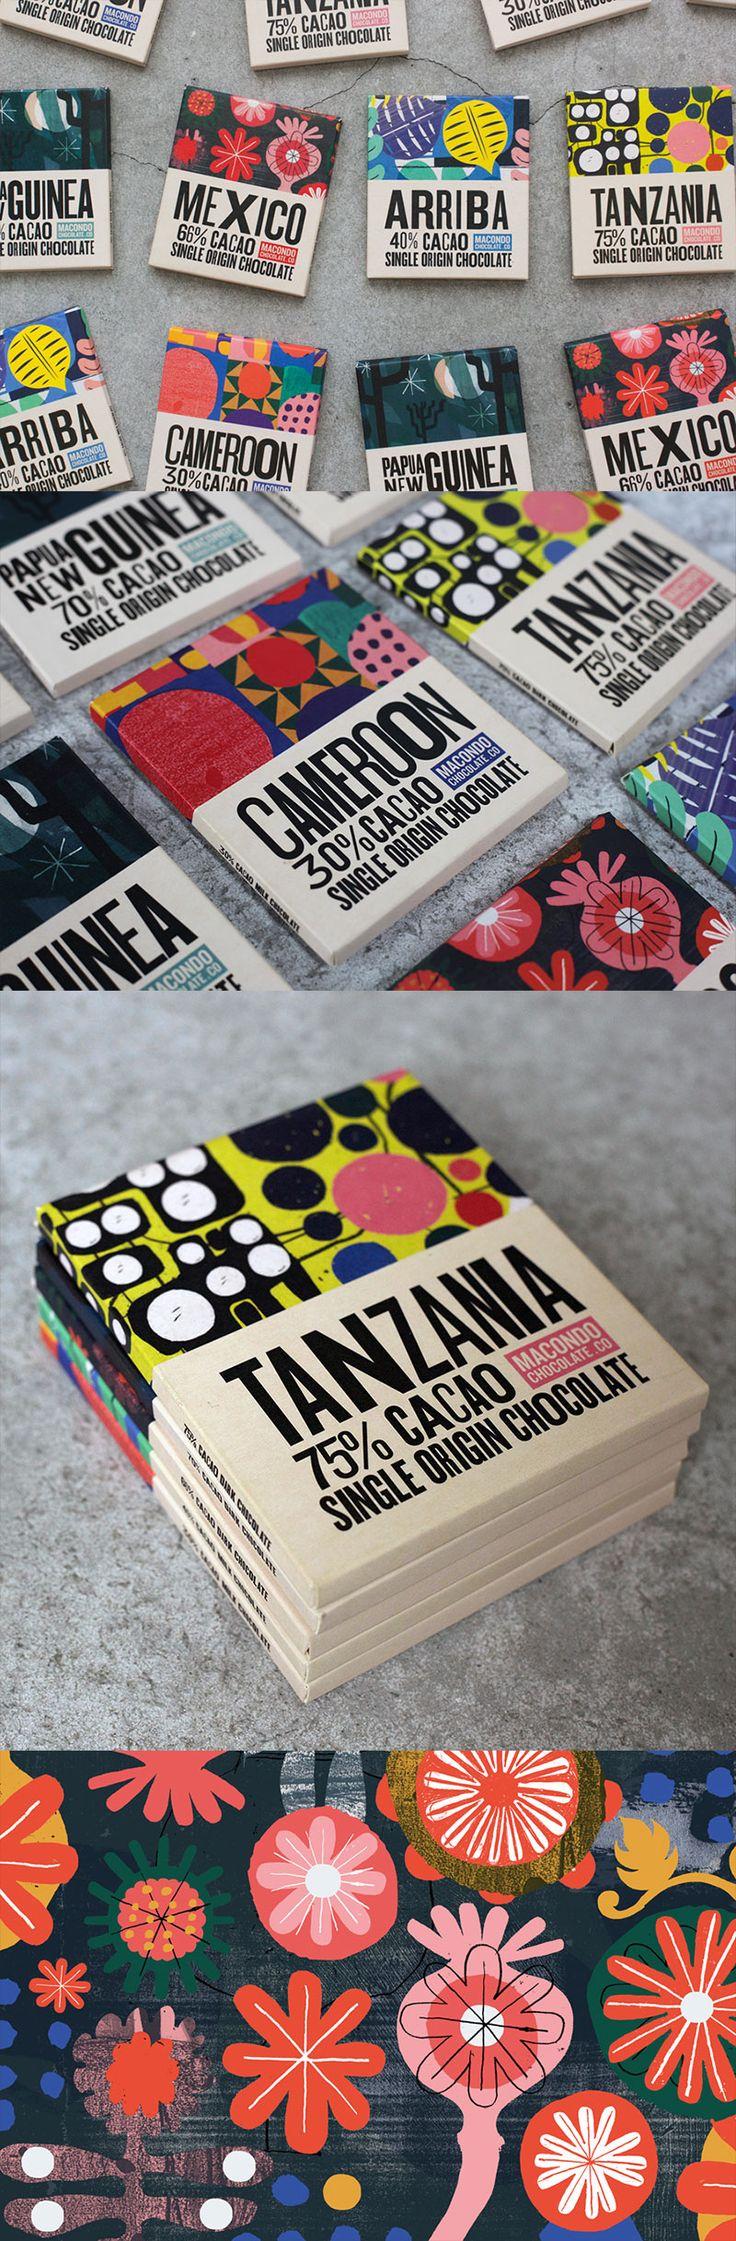 Macondo Chocolate Co by A-Side Studio